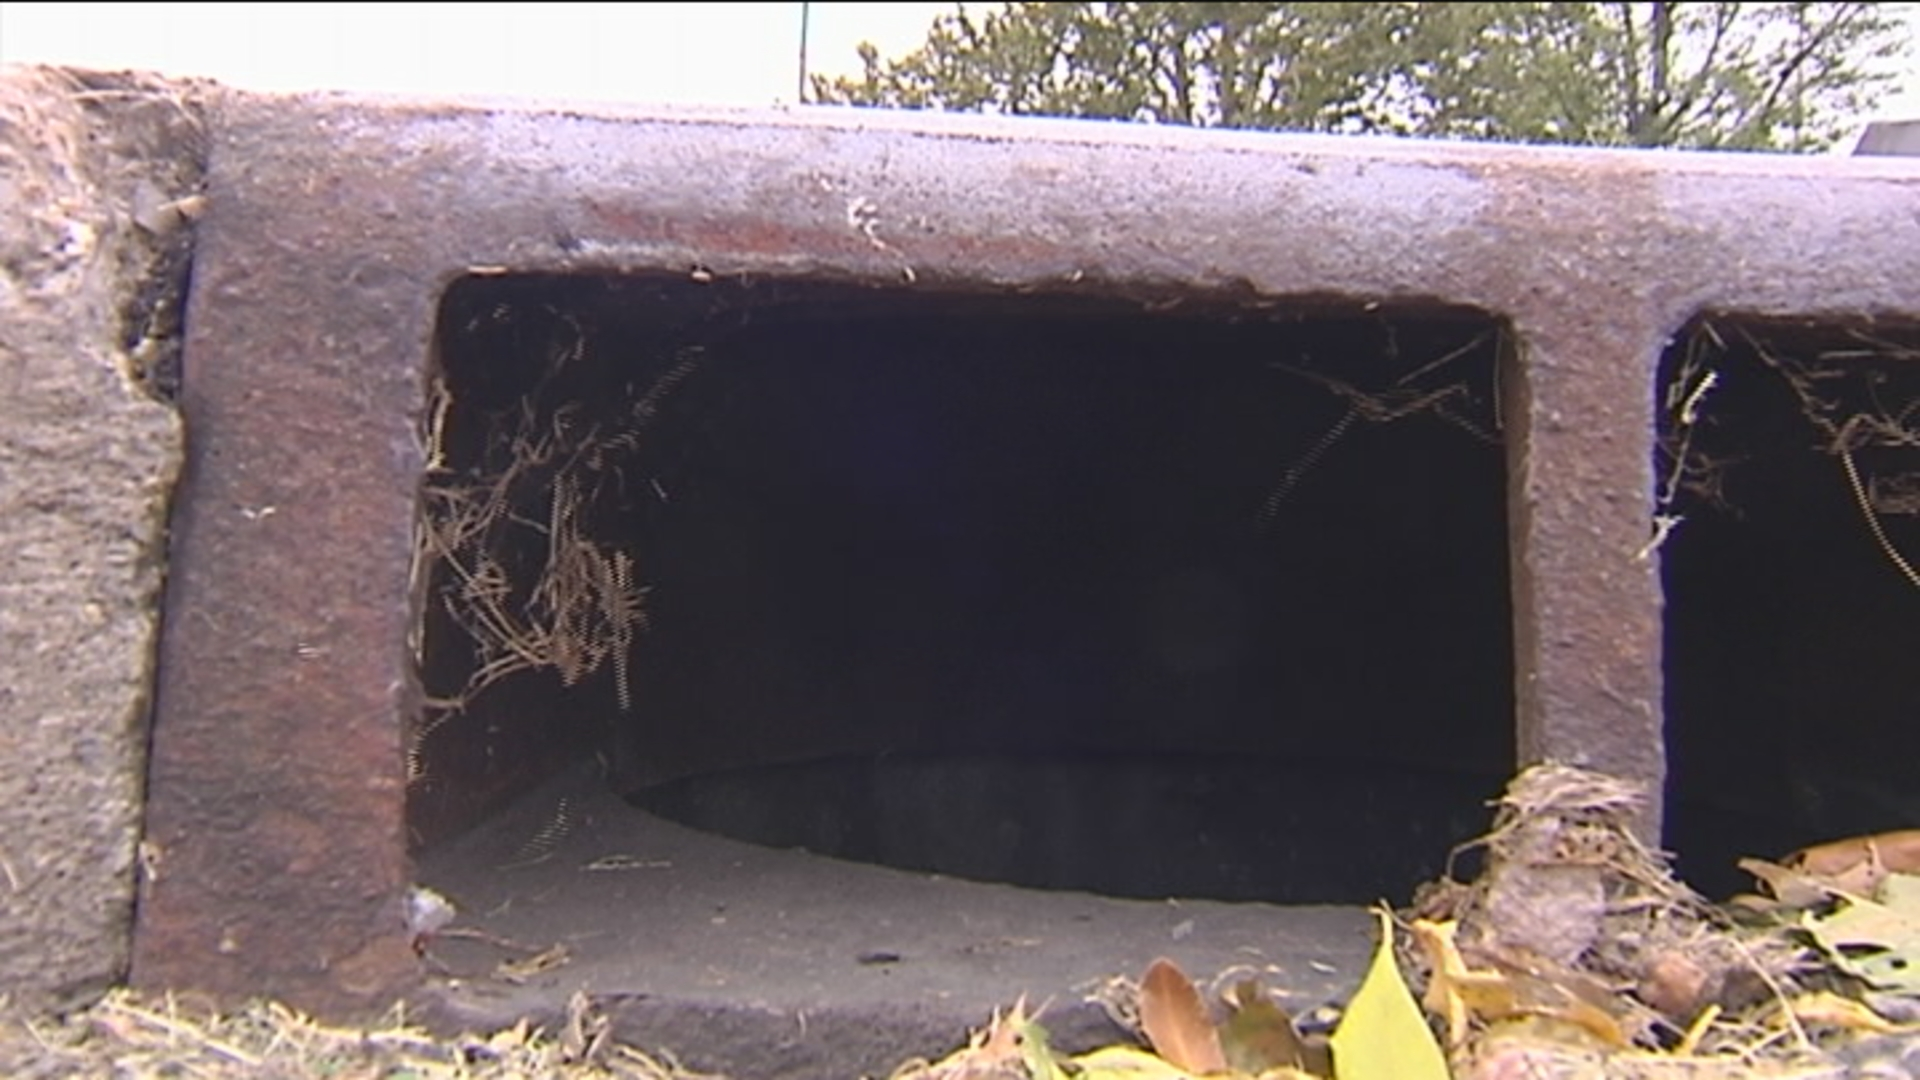 sewer rat remediation 4_1476395007887.jpg